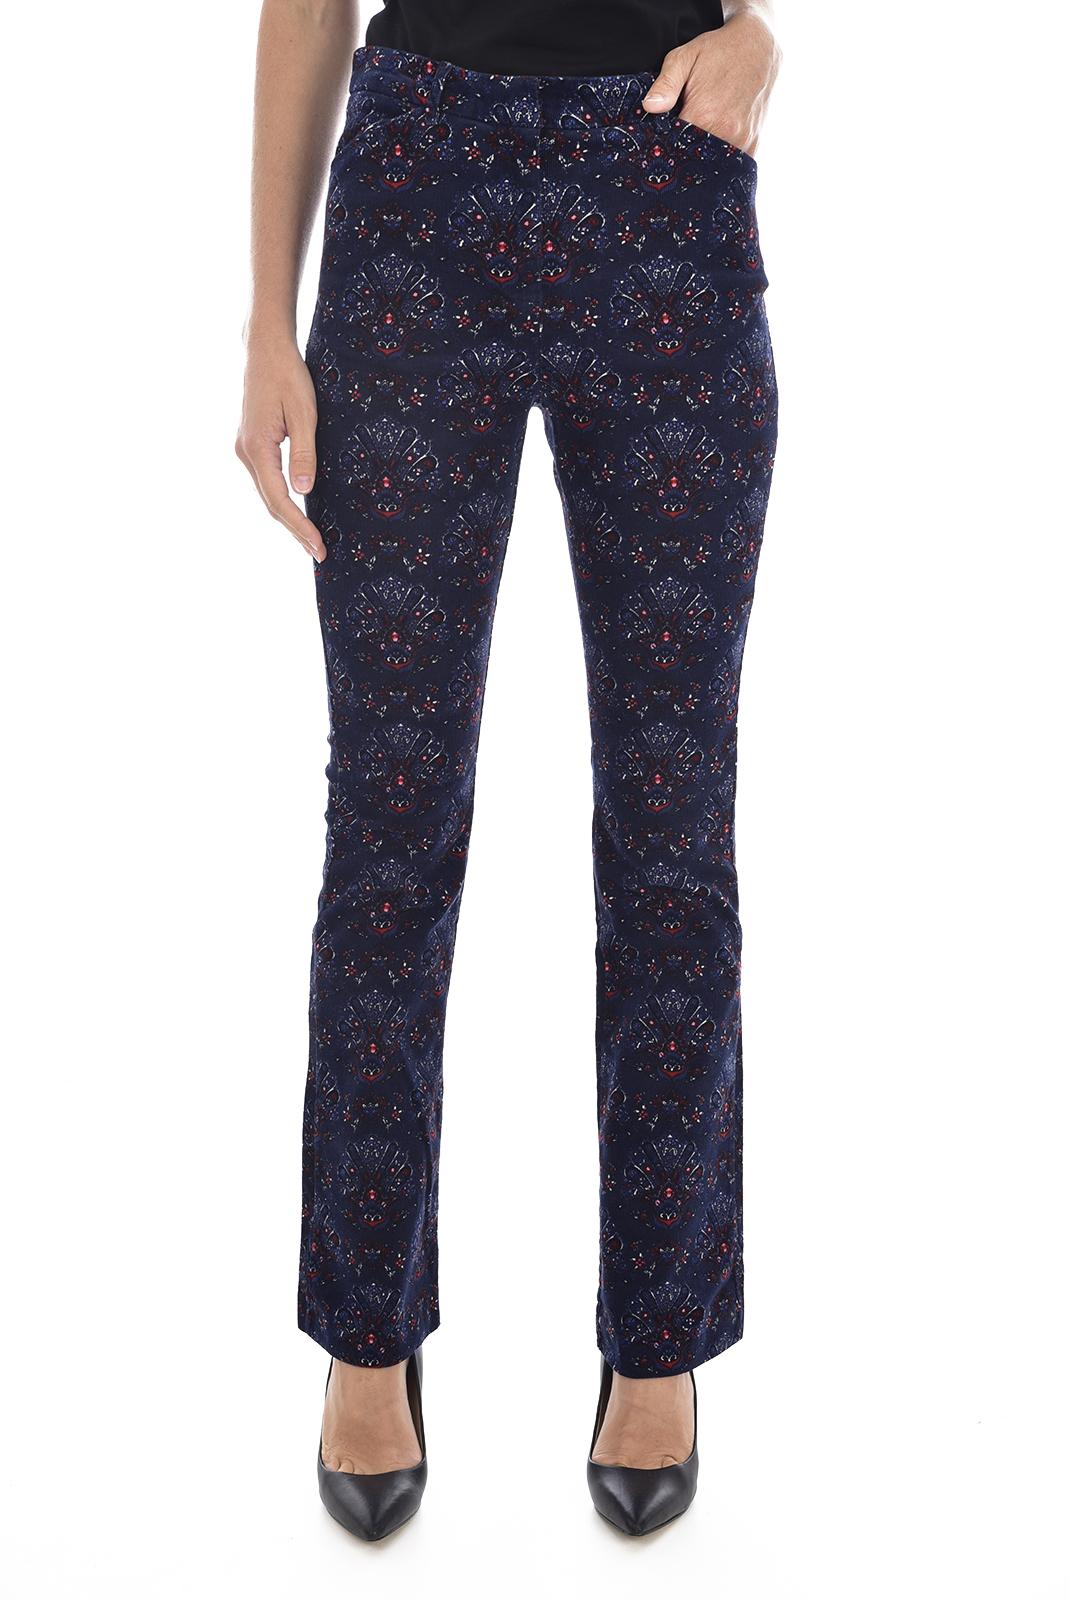 Pantalons  Pepe jeans PL210860 luela 592